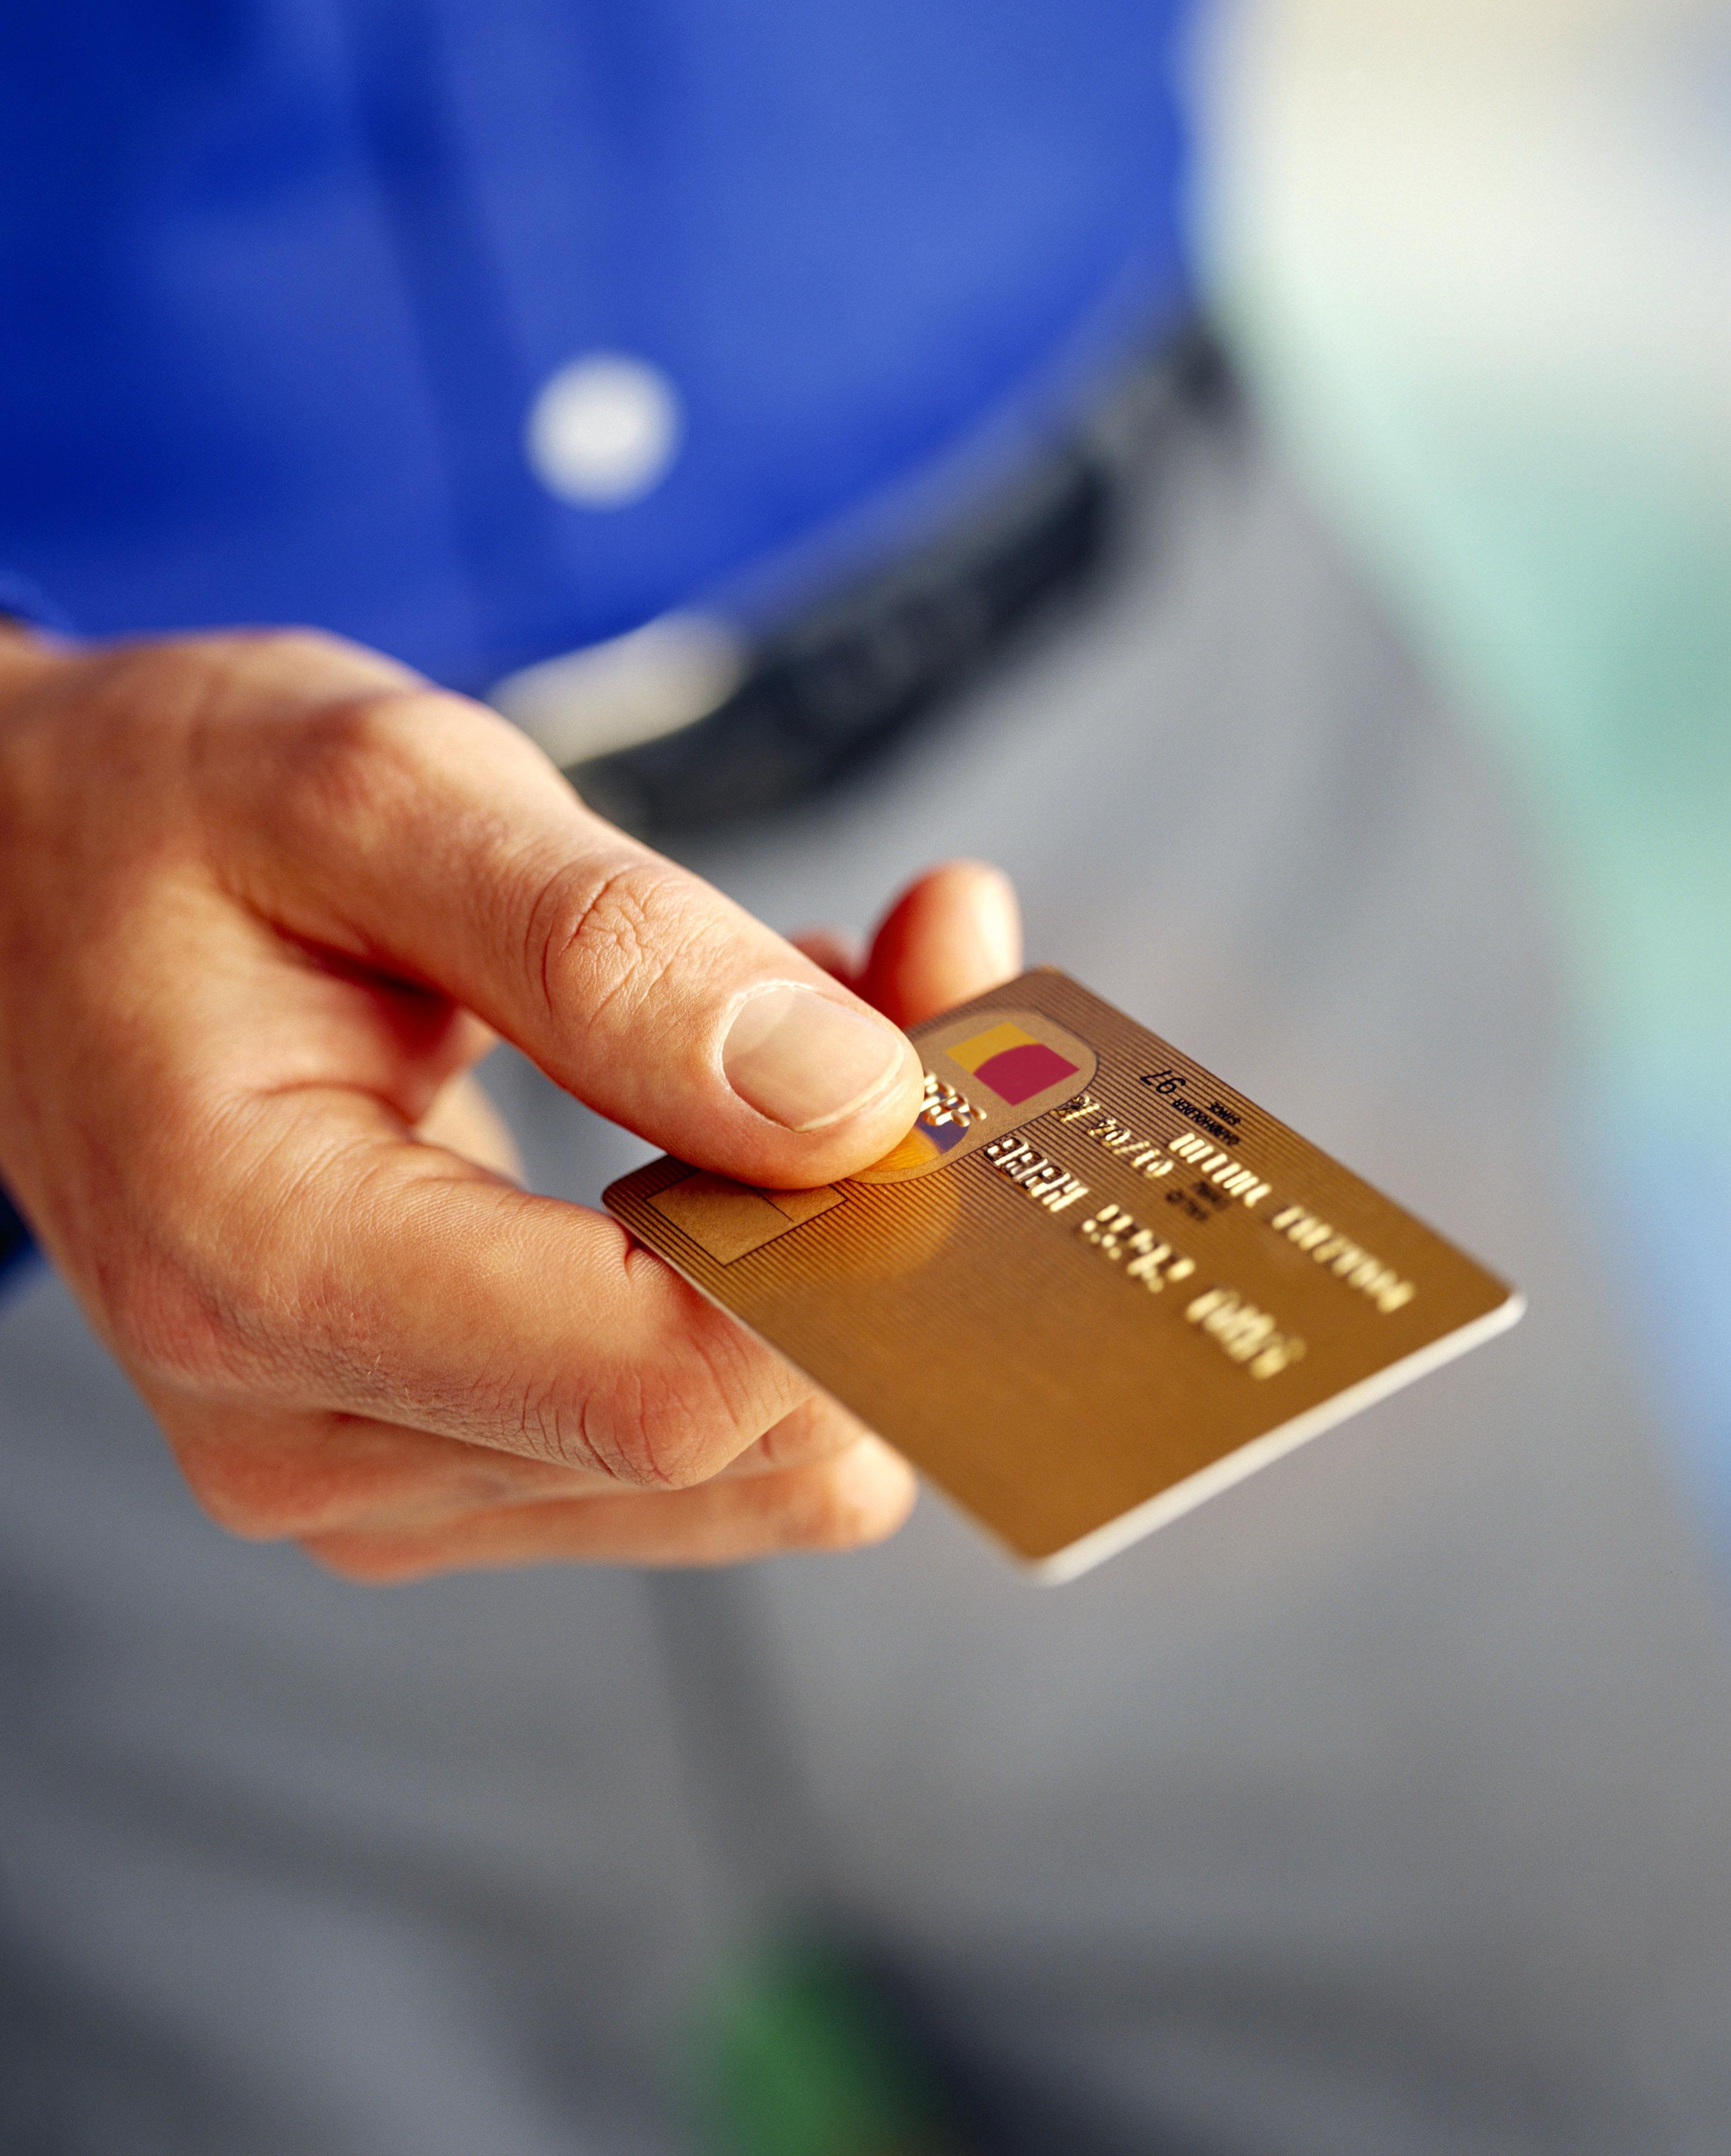 5c0be6449dcb25aa29e5_credit_card.jpg